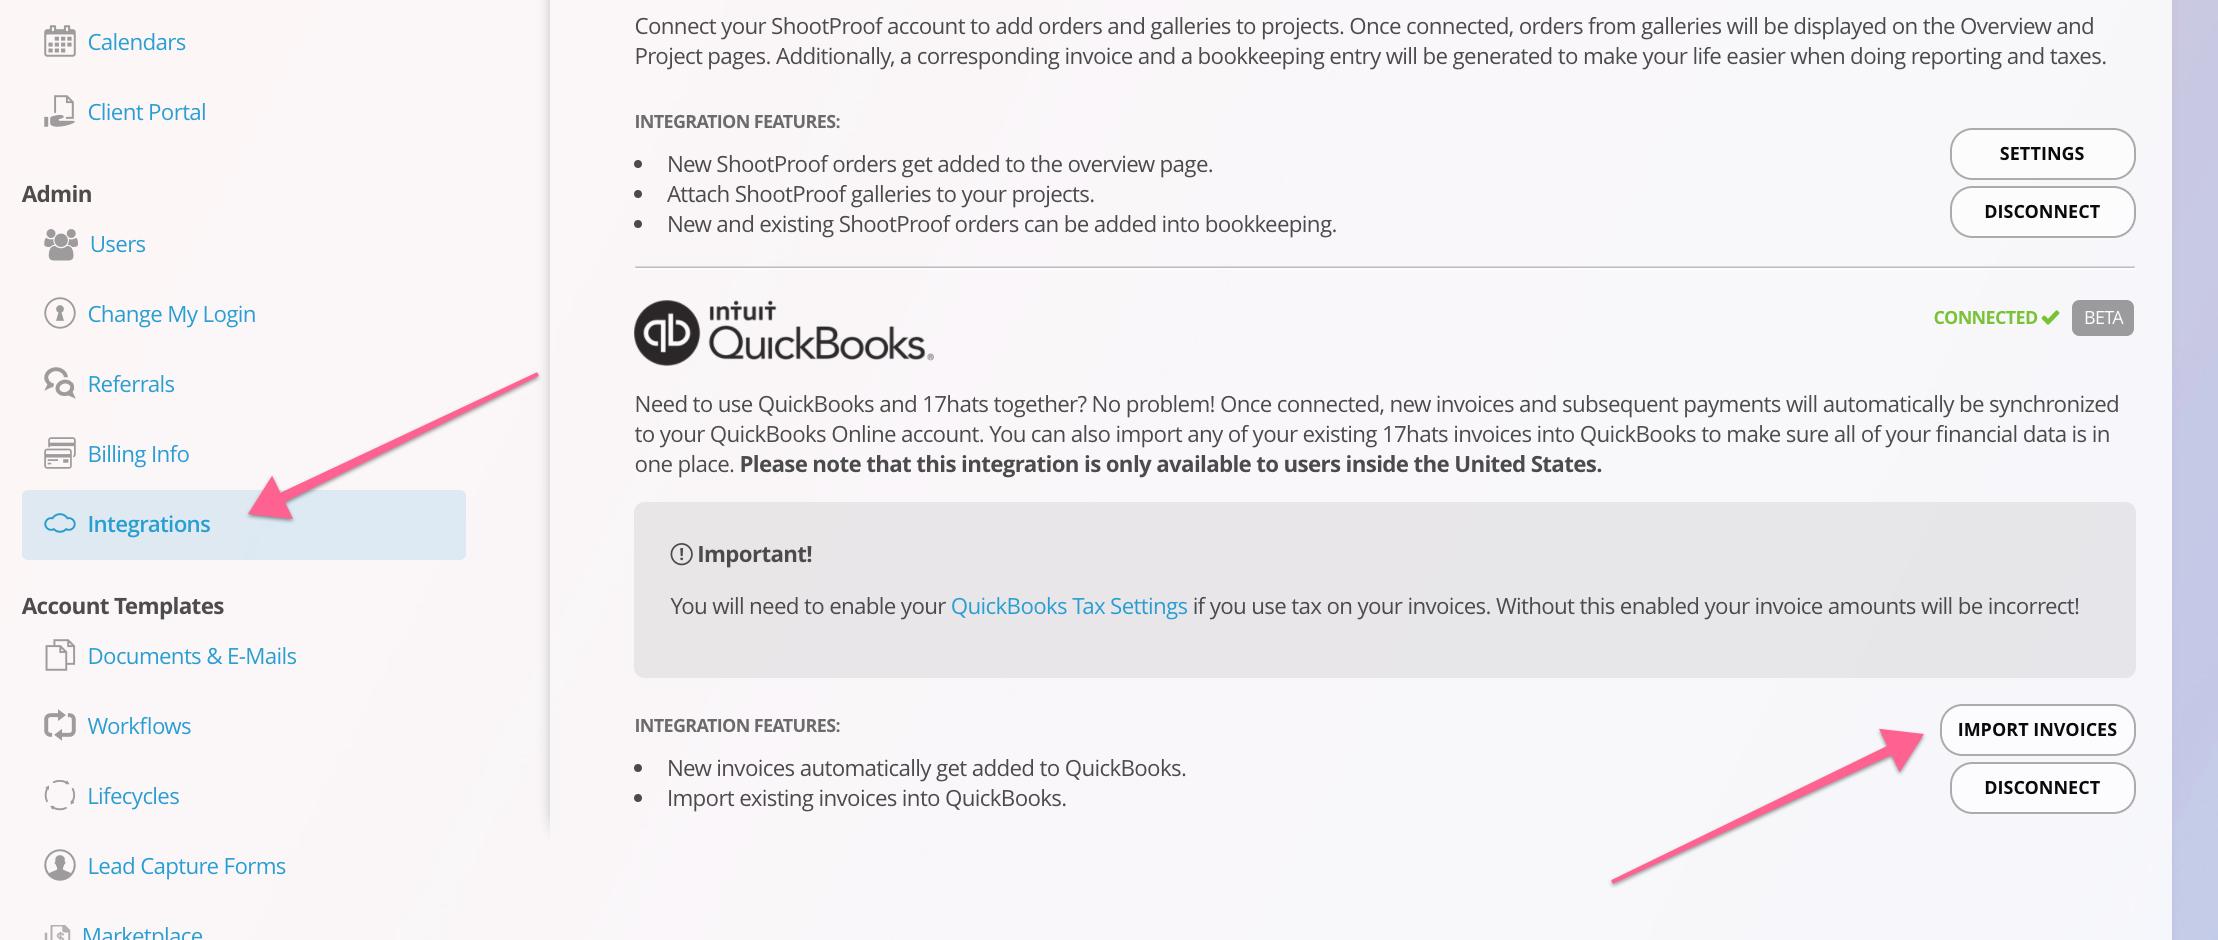 Hats Quickbooks Online Integration Hats Help Center - Import invoices into quickbooks online